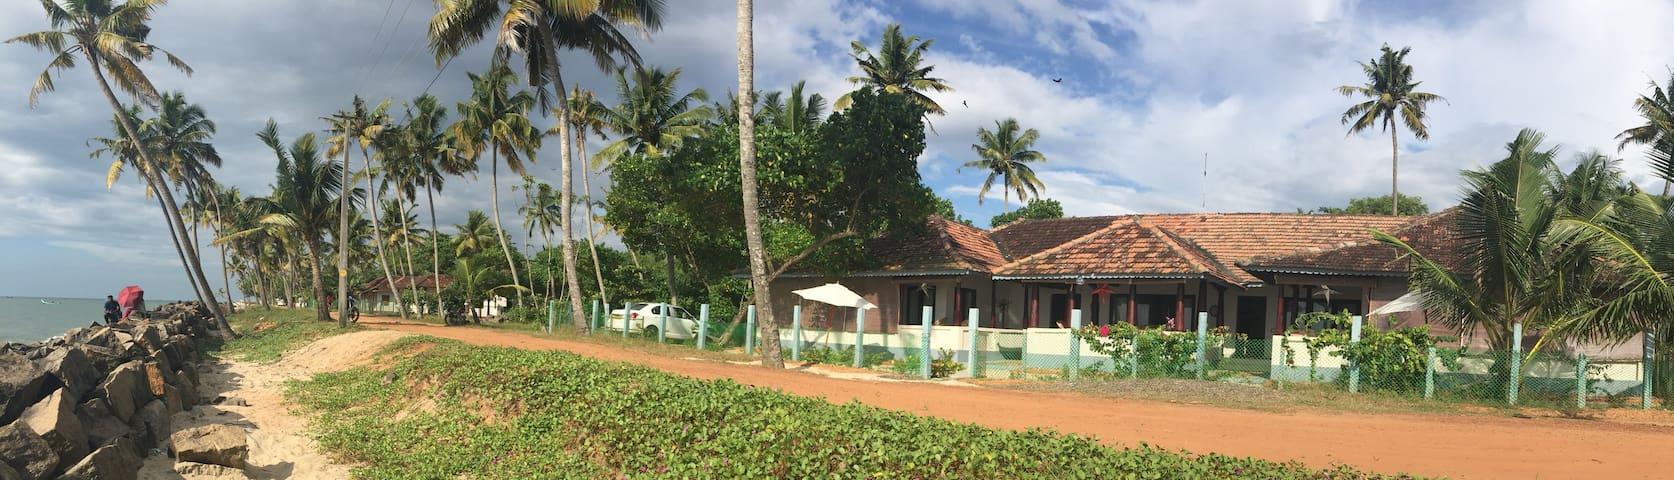 Samudrasukh: 3-room bungalow - Alappuzha - Hus